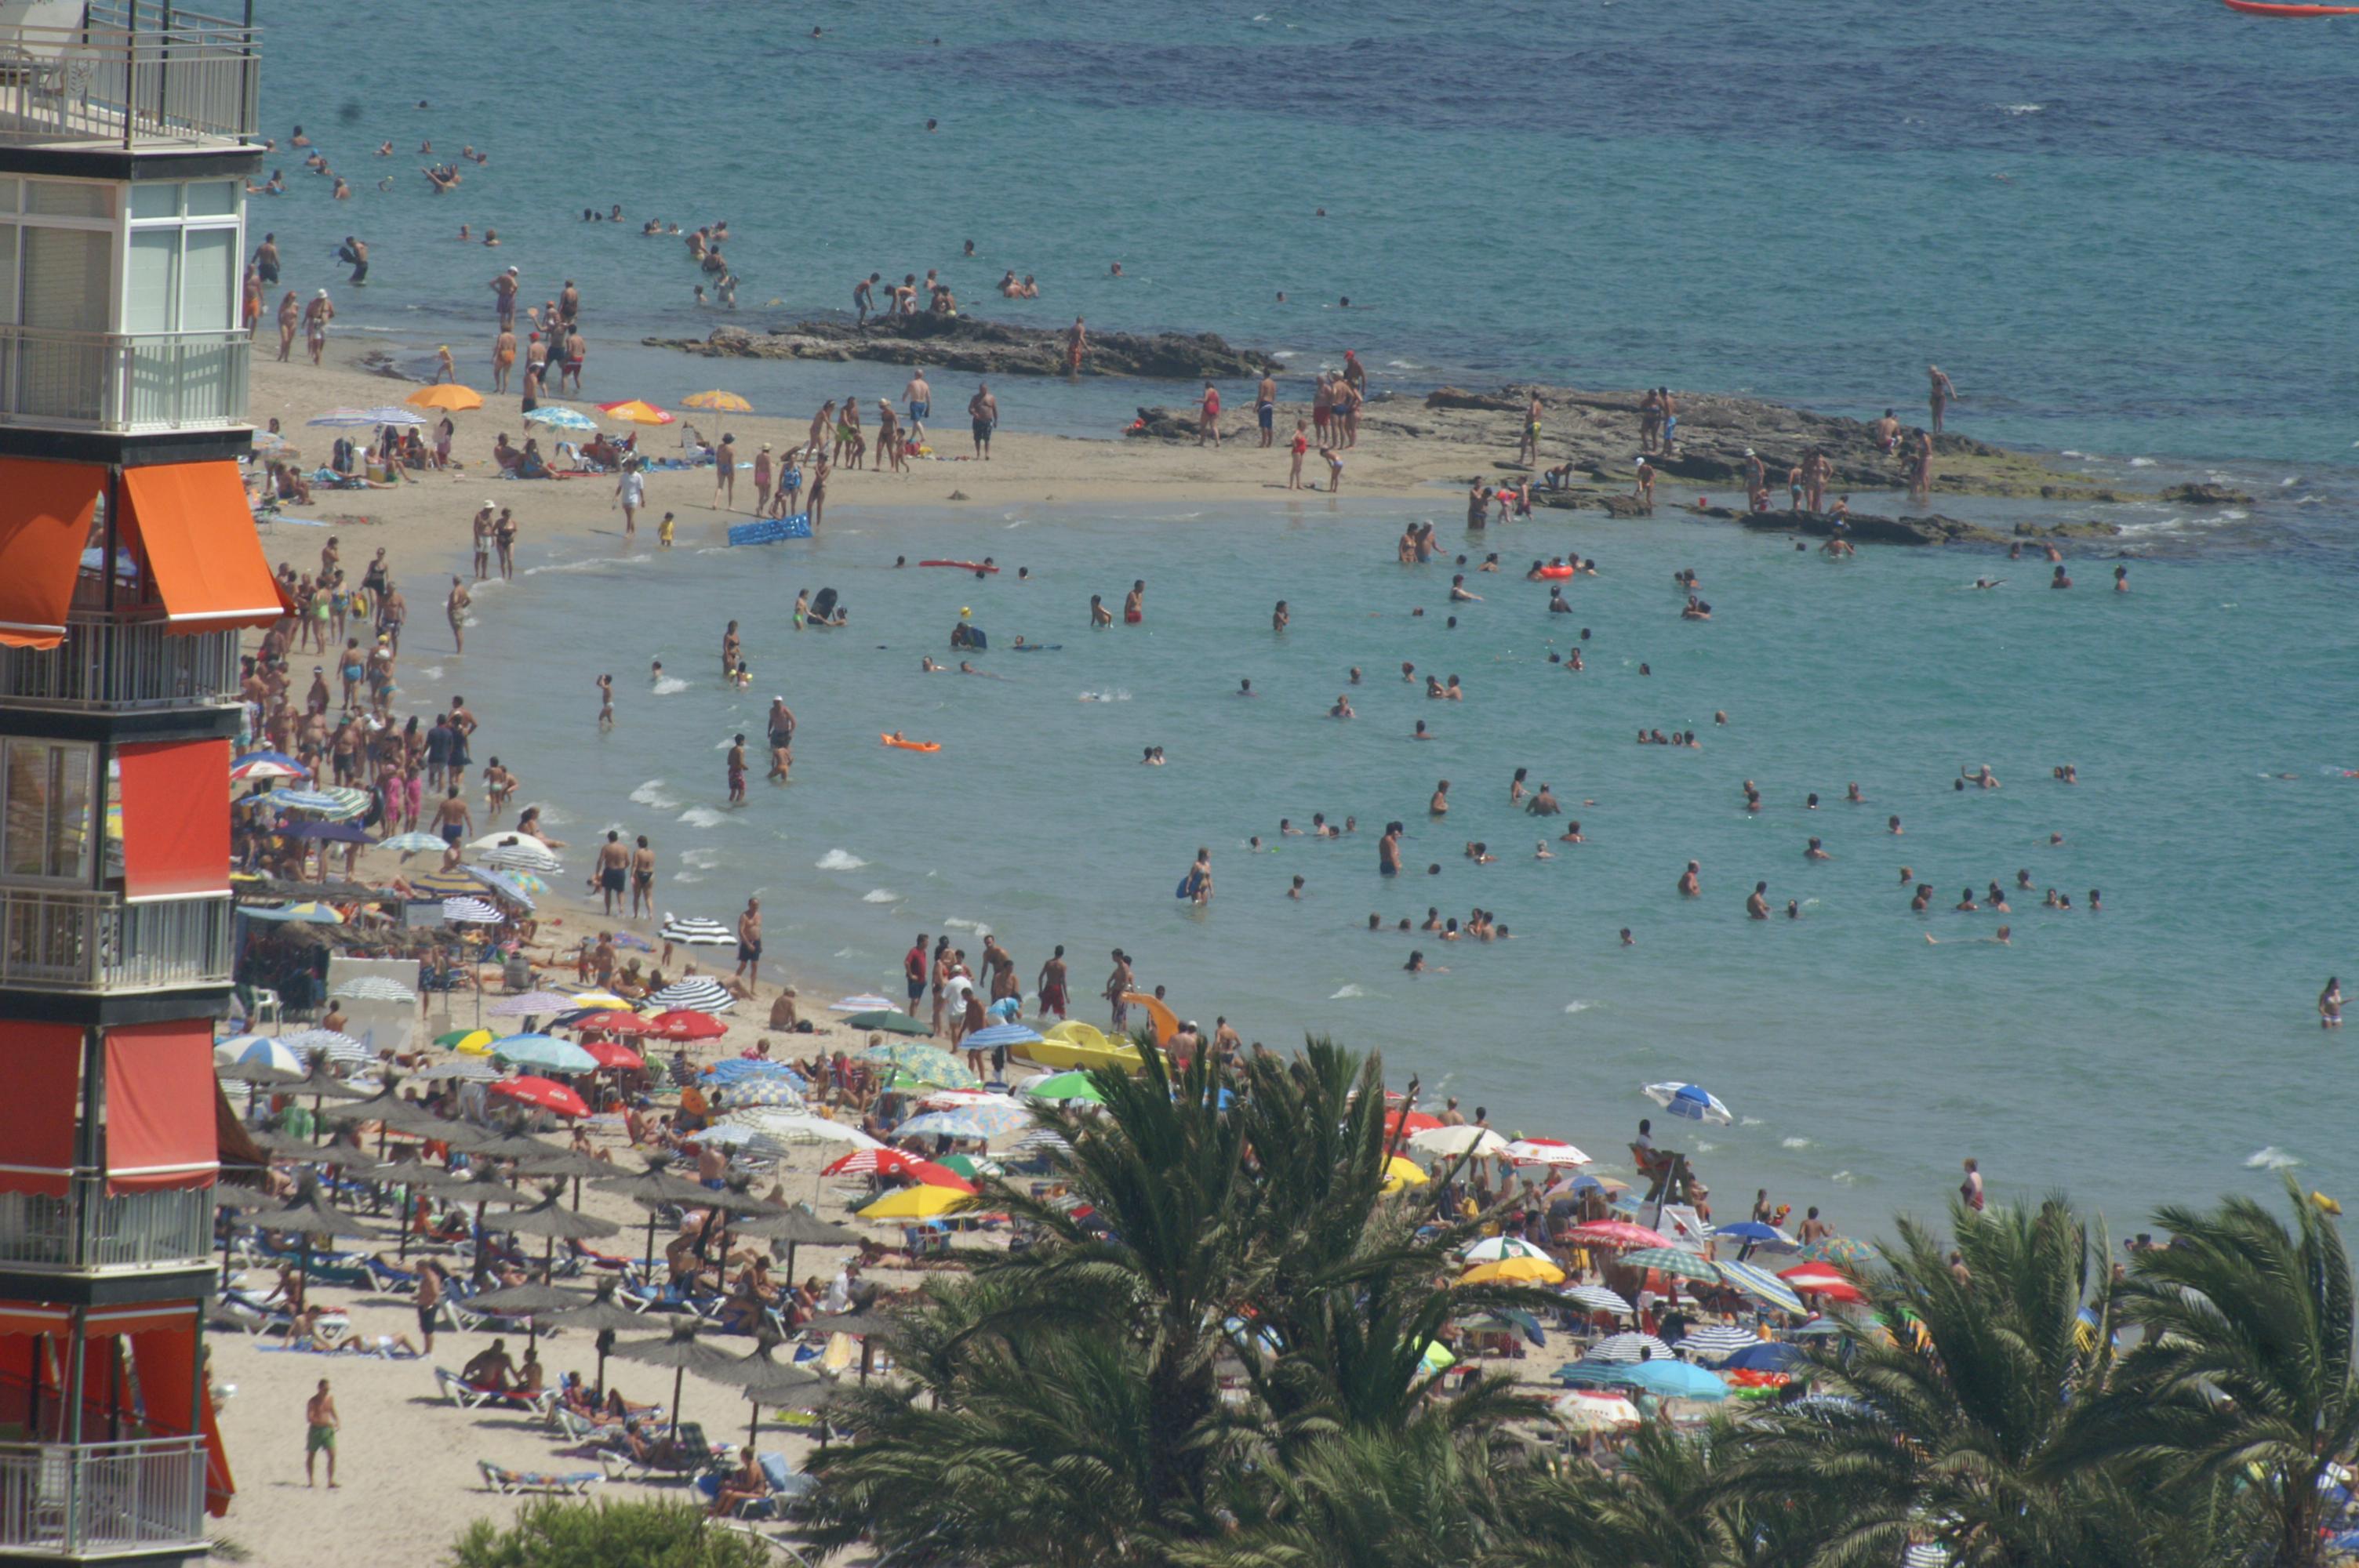 Playa Calas de Rocamar